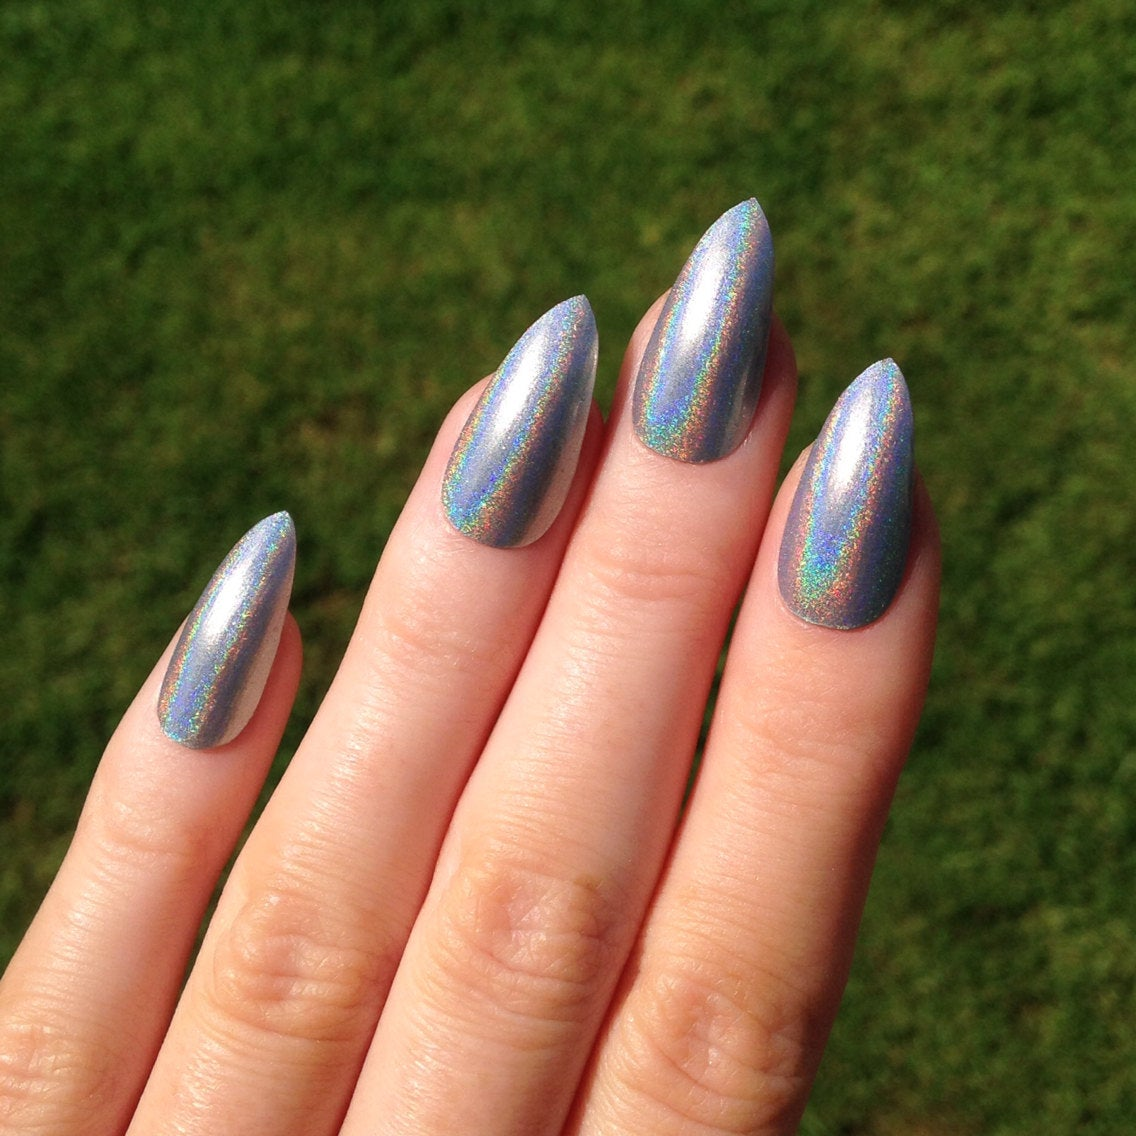 silver stiletto nails photo - 1